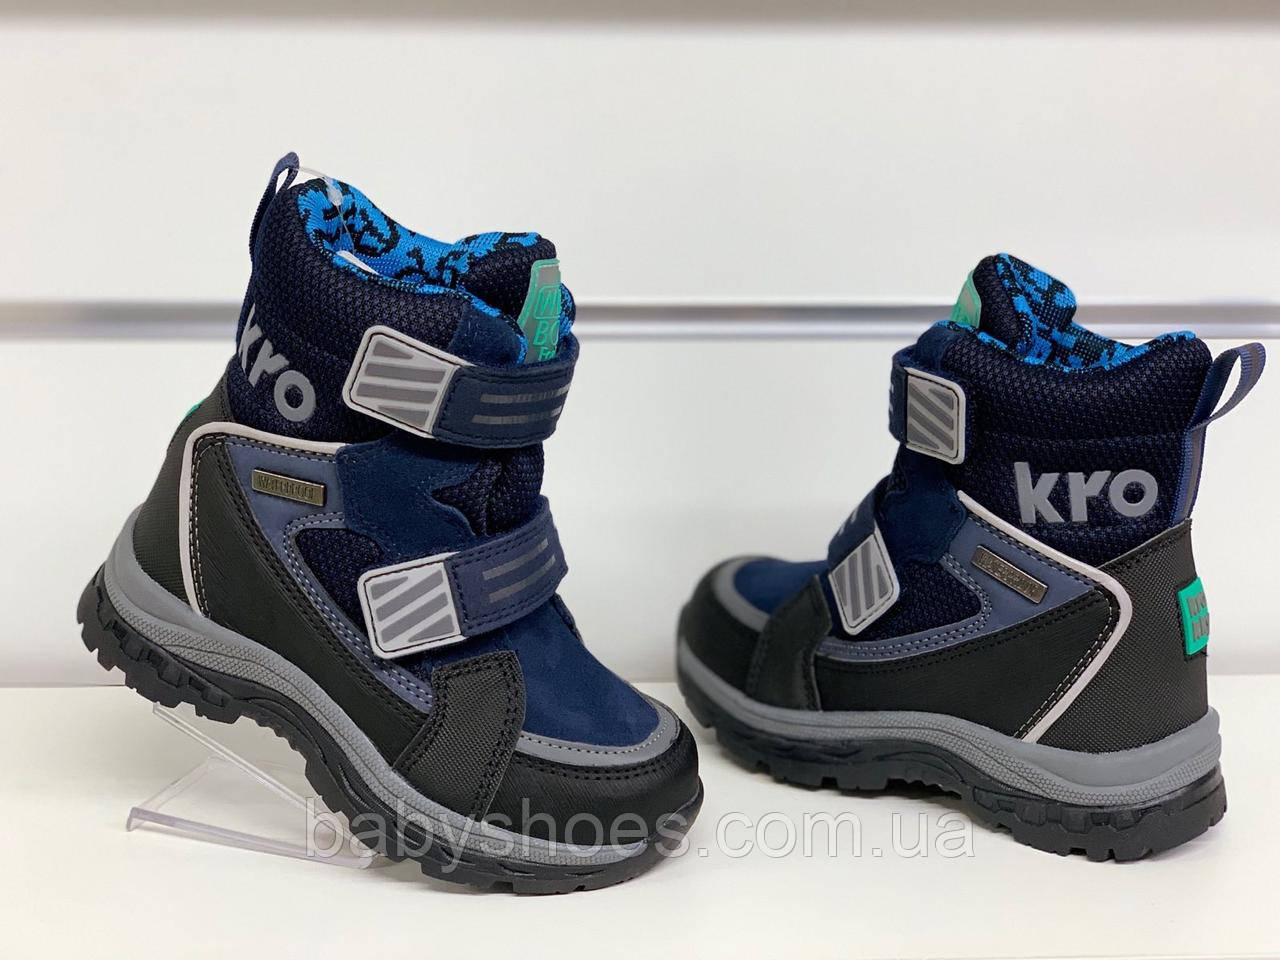 Зимние термо-ботинки, сноубутсы для мальчика Krokky мембрана р.28-33